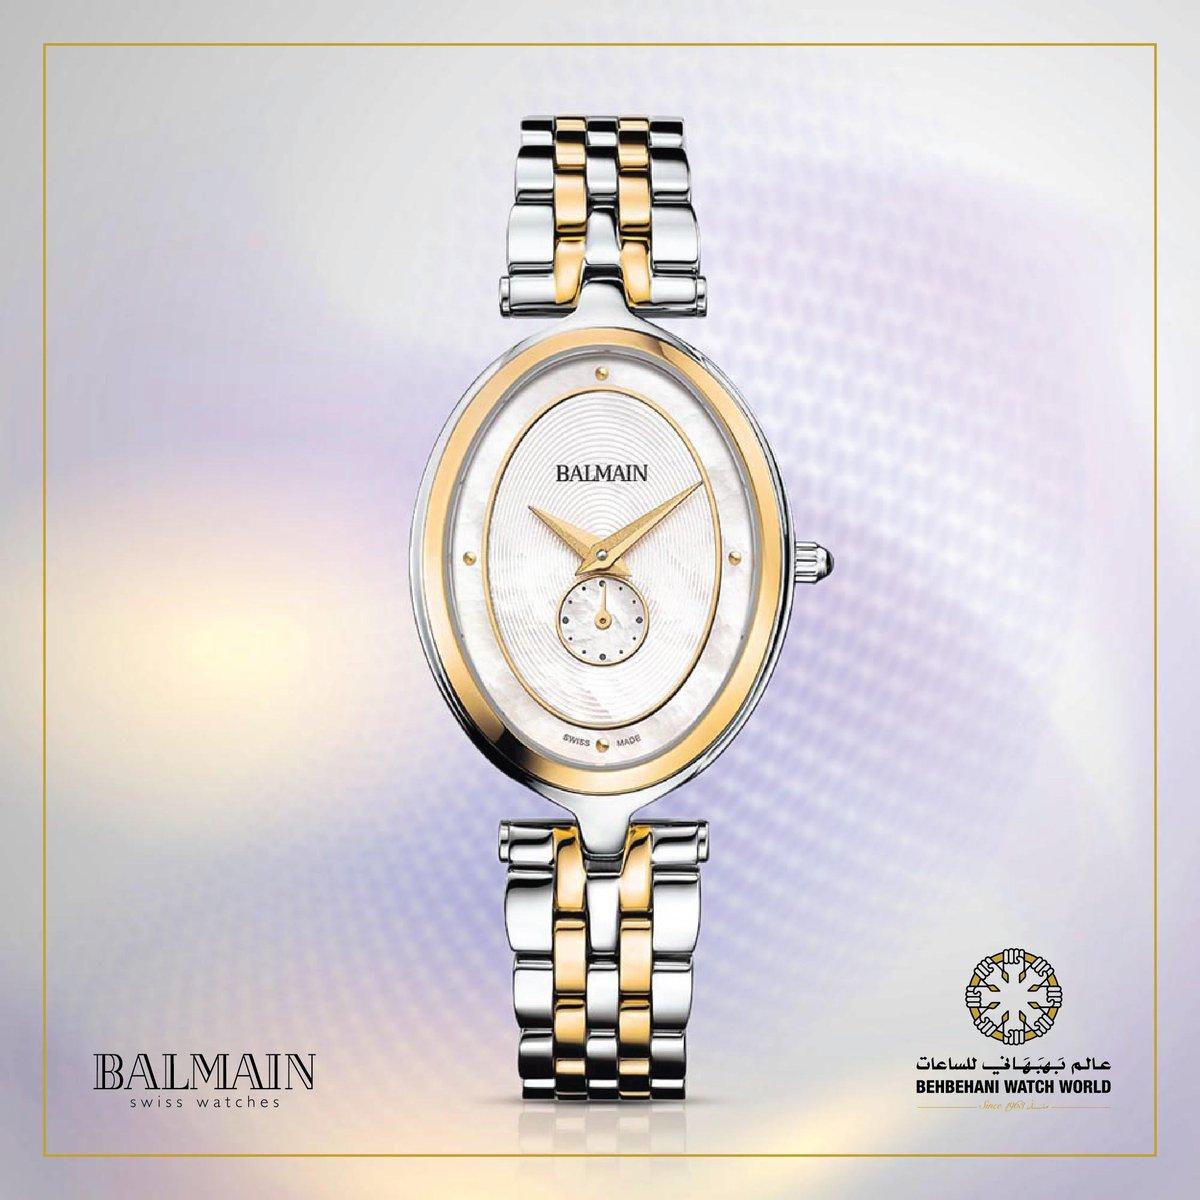 9babb1b4d #Balmain #balmainwatch #SwissMade #Kuwait #BehbehaniWatchWorld #Watch  #Ladiespic.twitter.com/lzMKWbFEo3